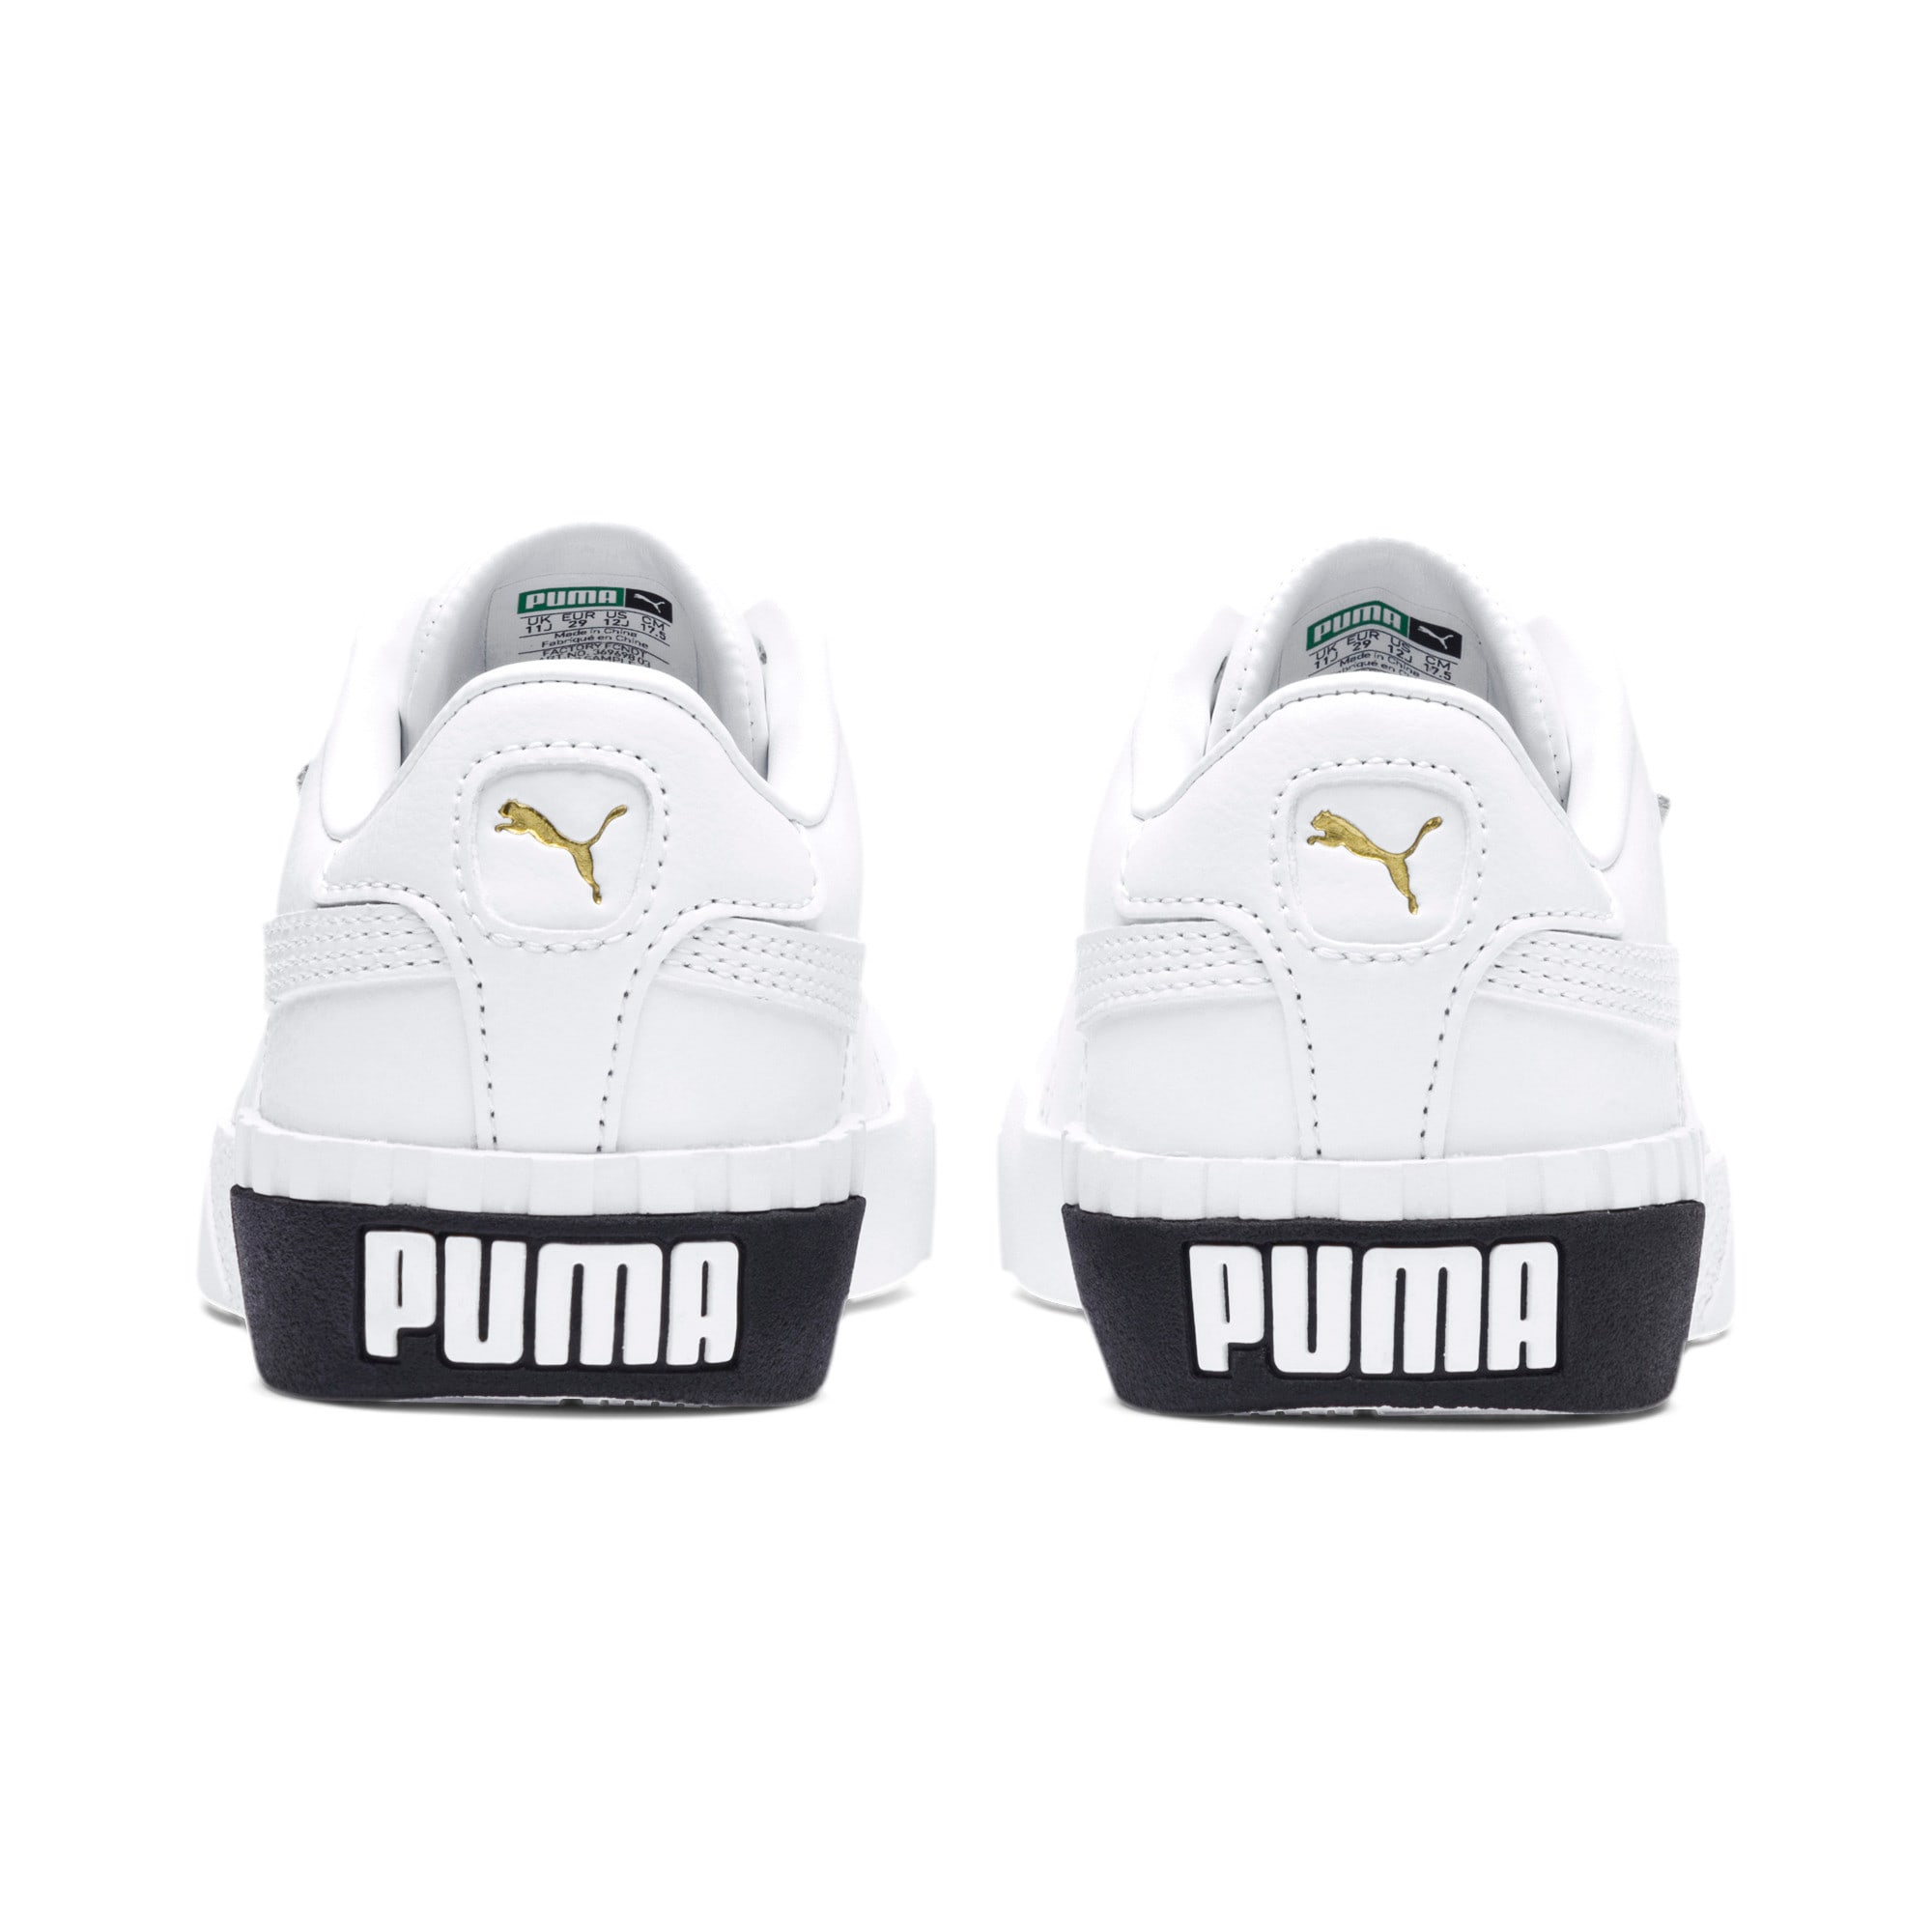 Thumbnail 3 of Cali Kids' Mädchen Sneaker, Puma White-Puma Black, medium